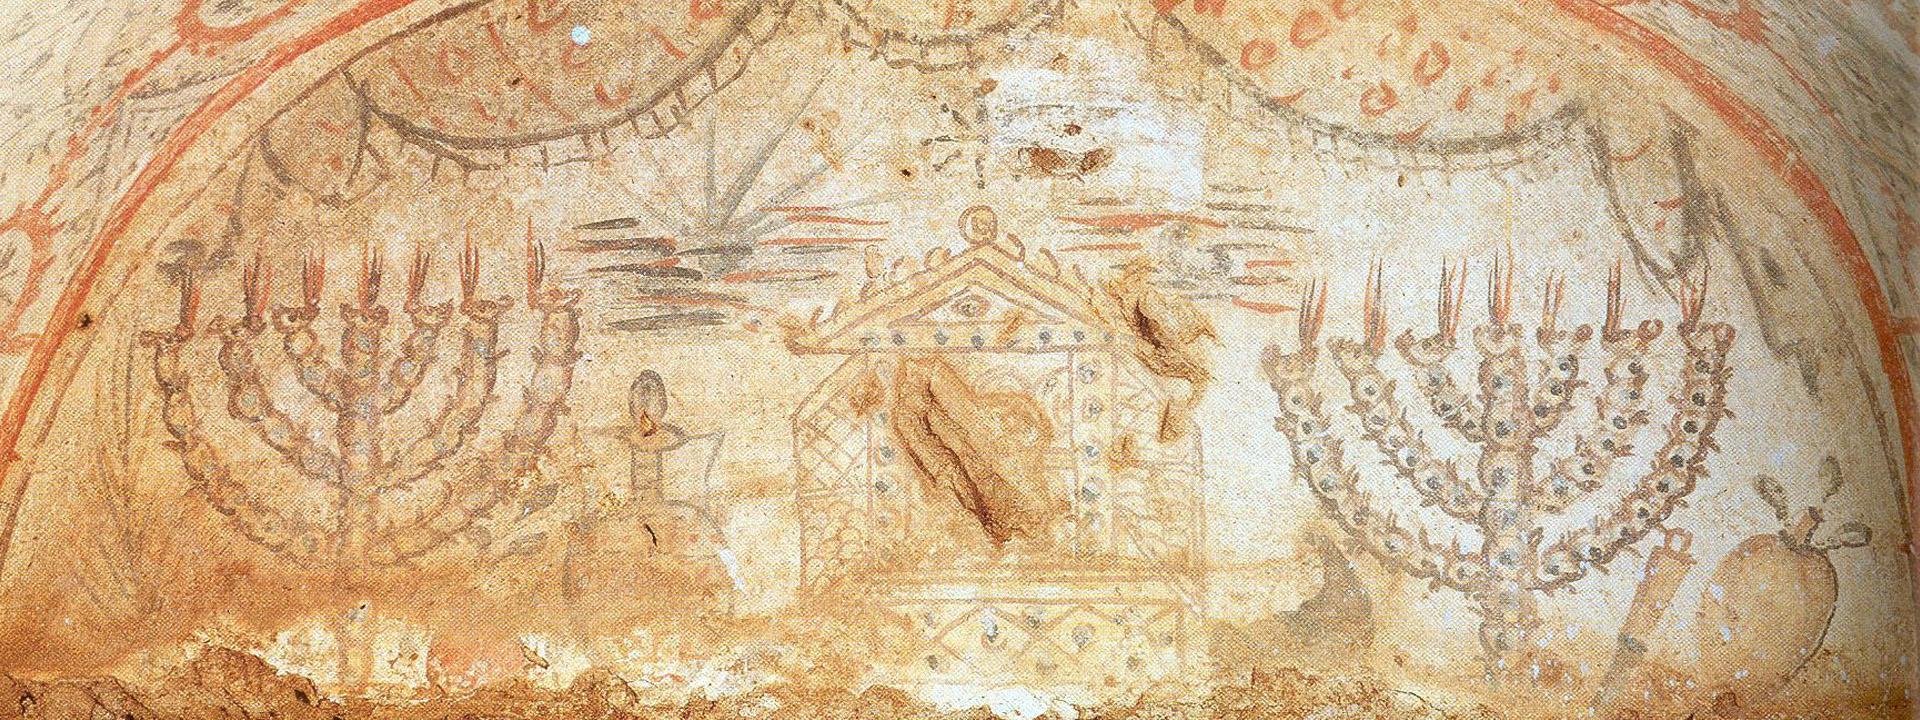 ARCHAEOLOGY OF JUDAISM